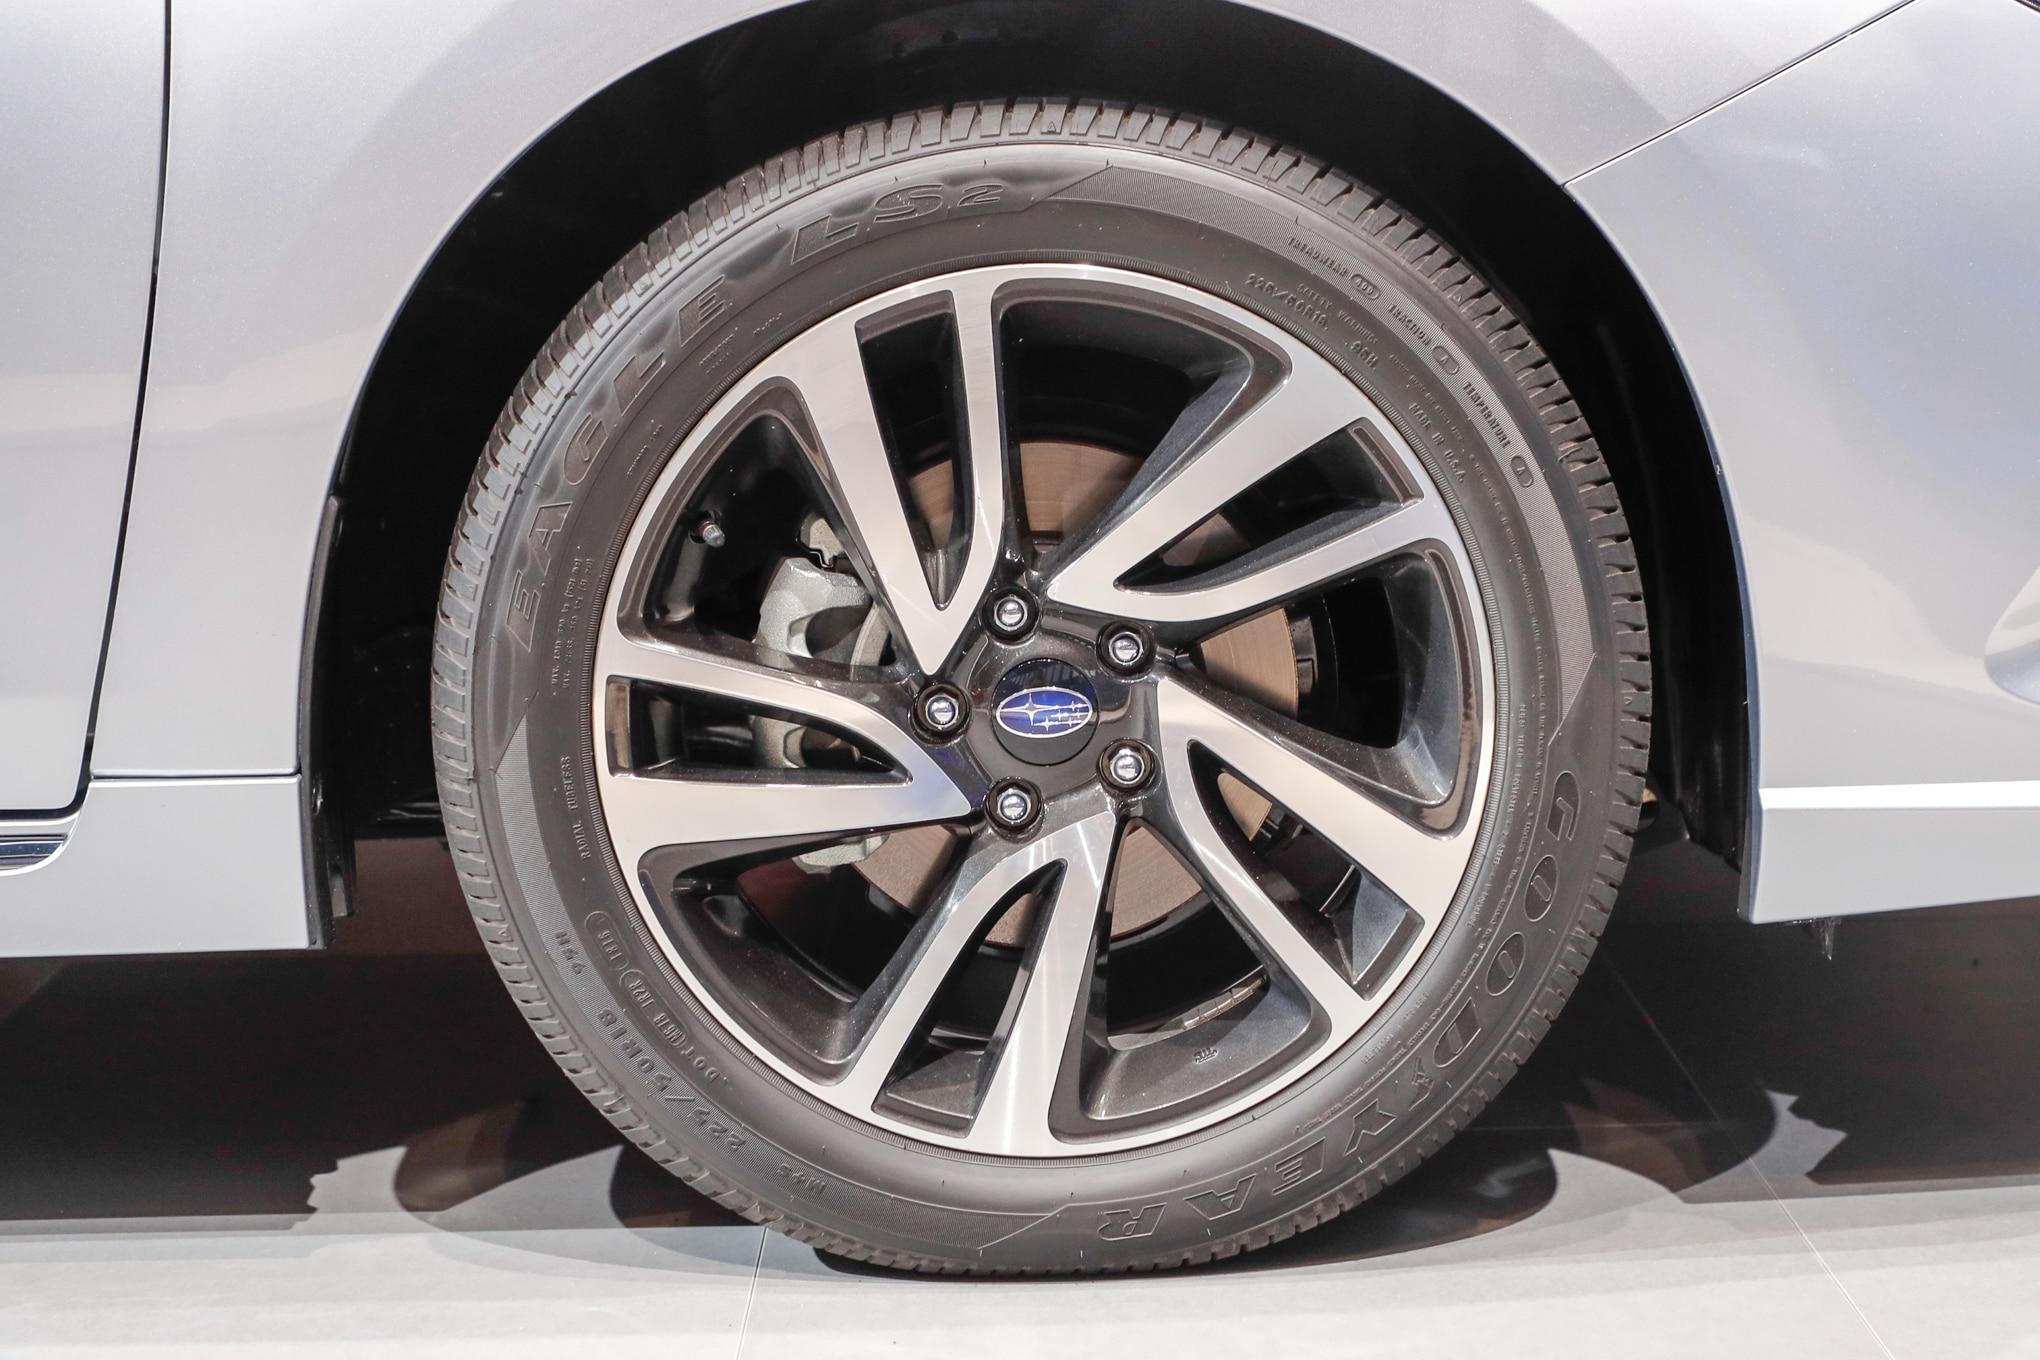 Subaru Legacy: Tires